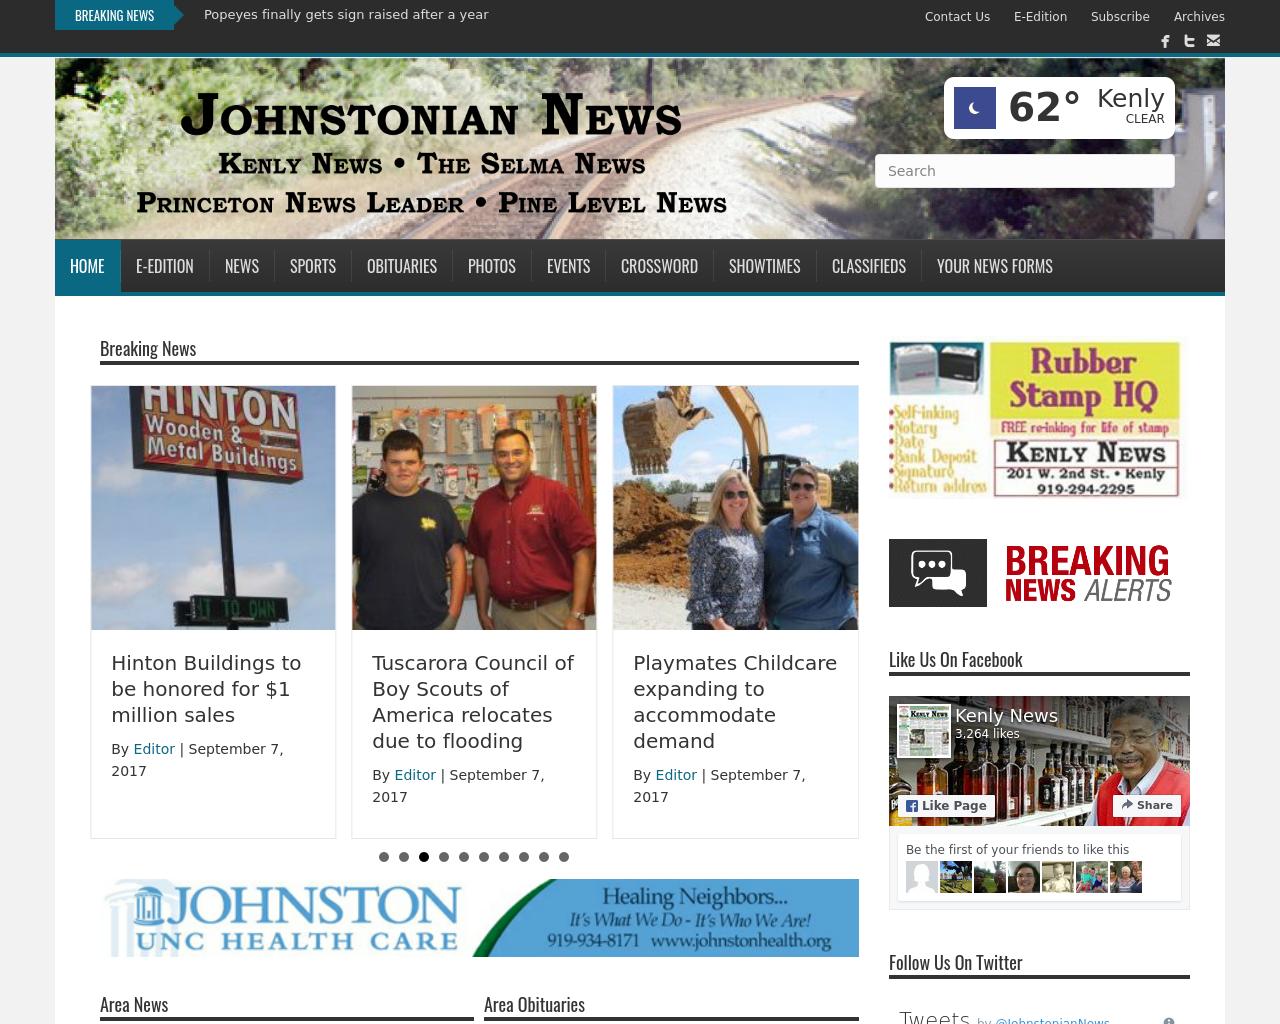 Johnstonian-News-Advertising-Reviews-Pricing